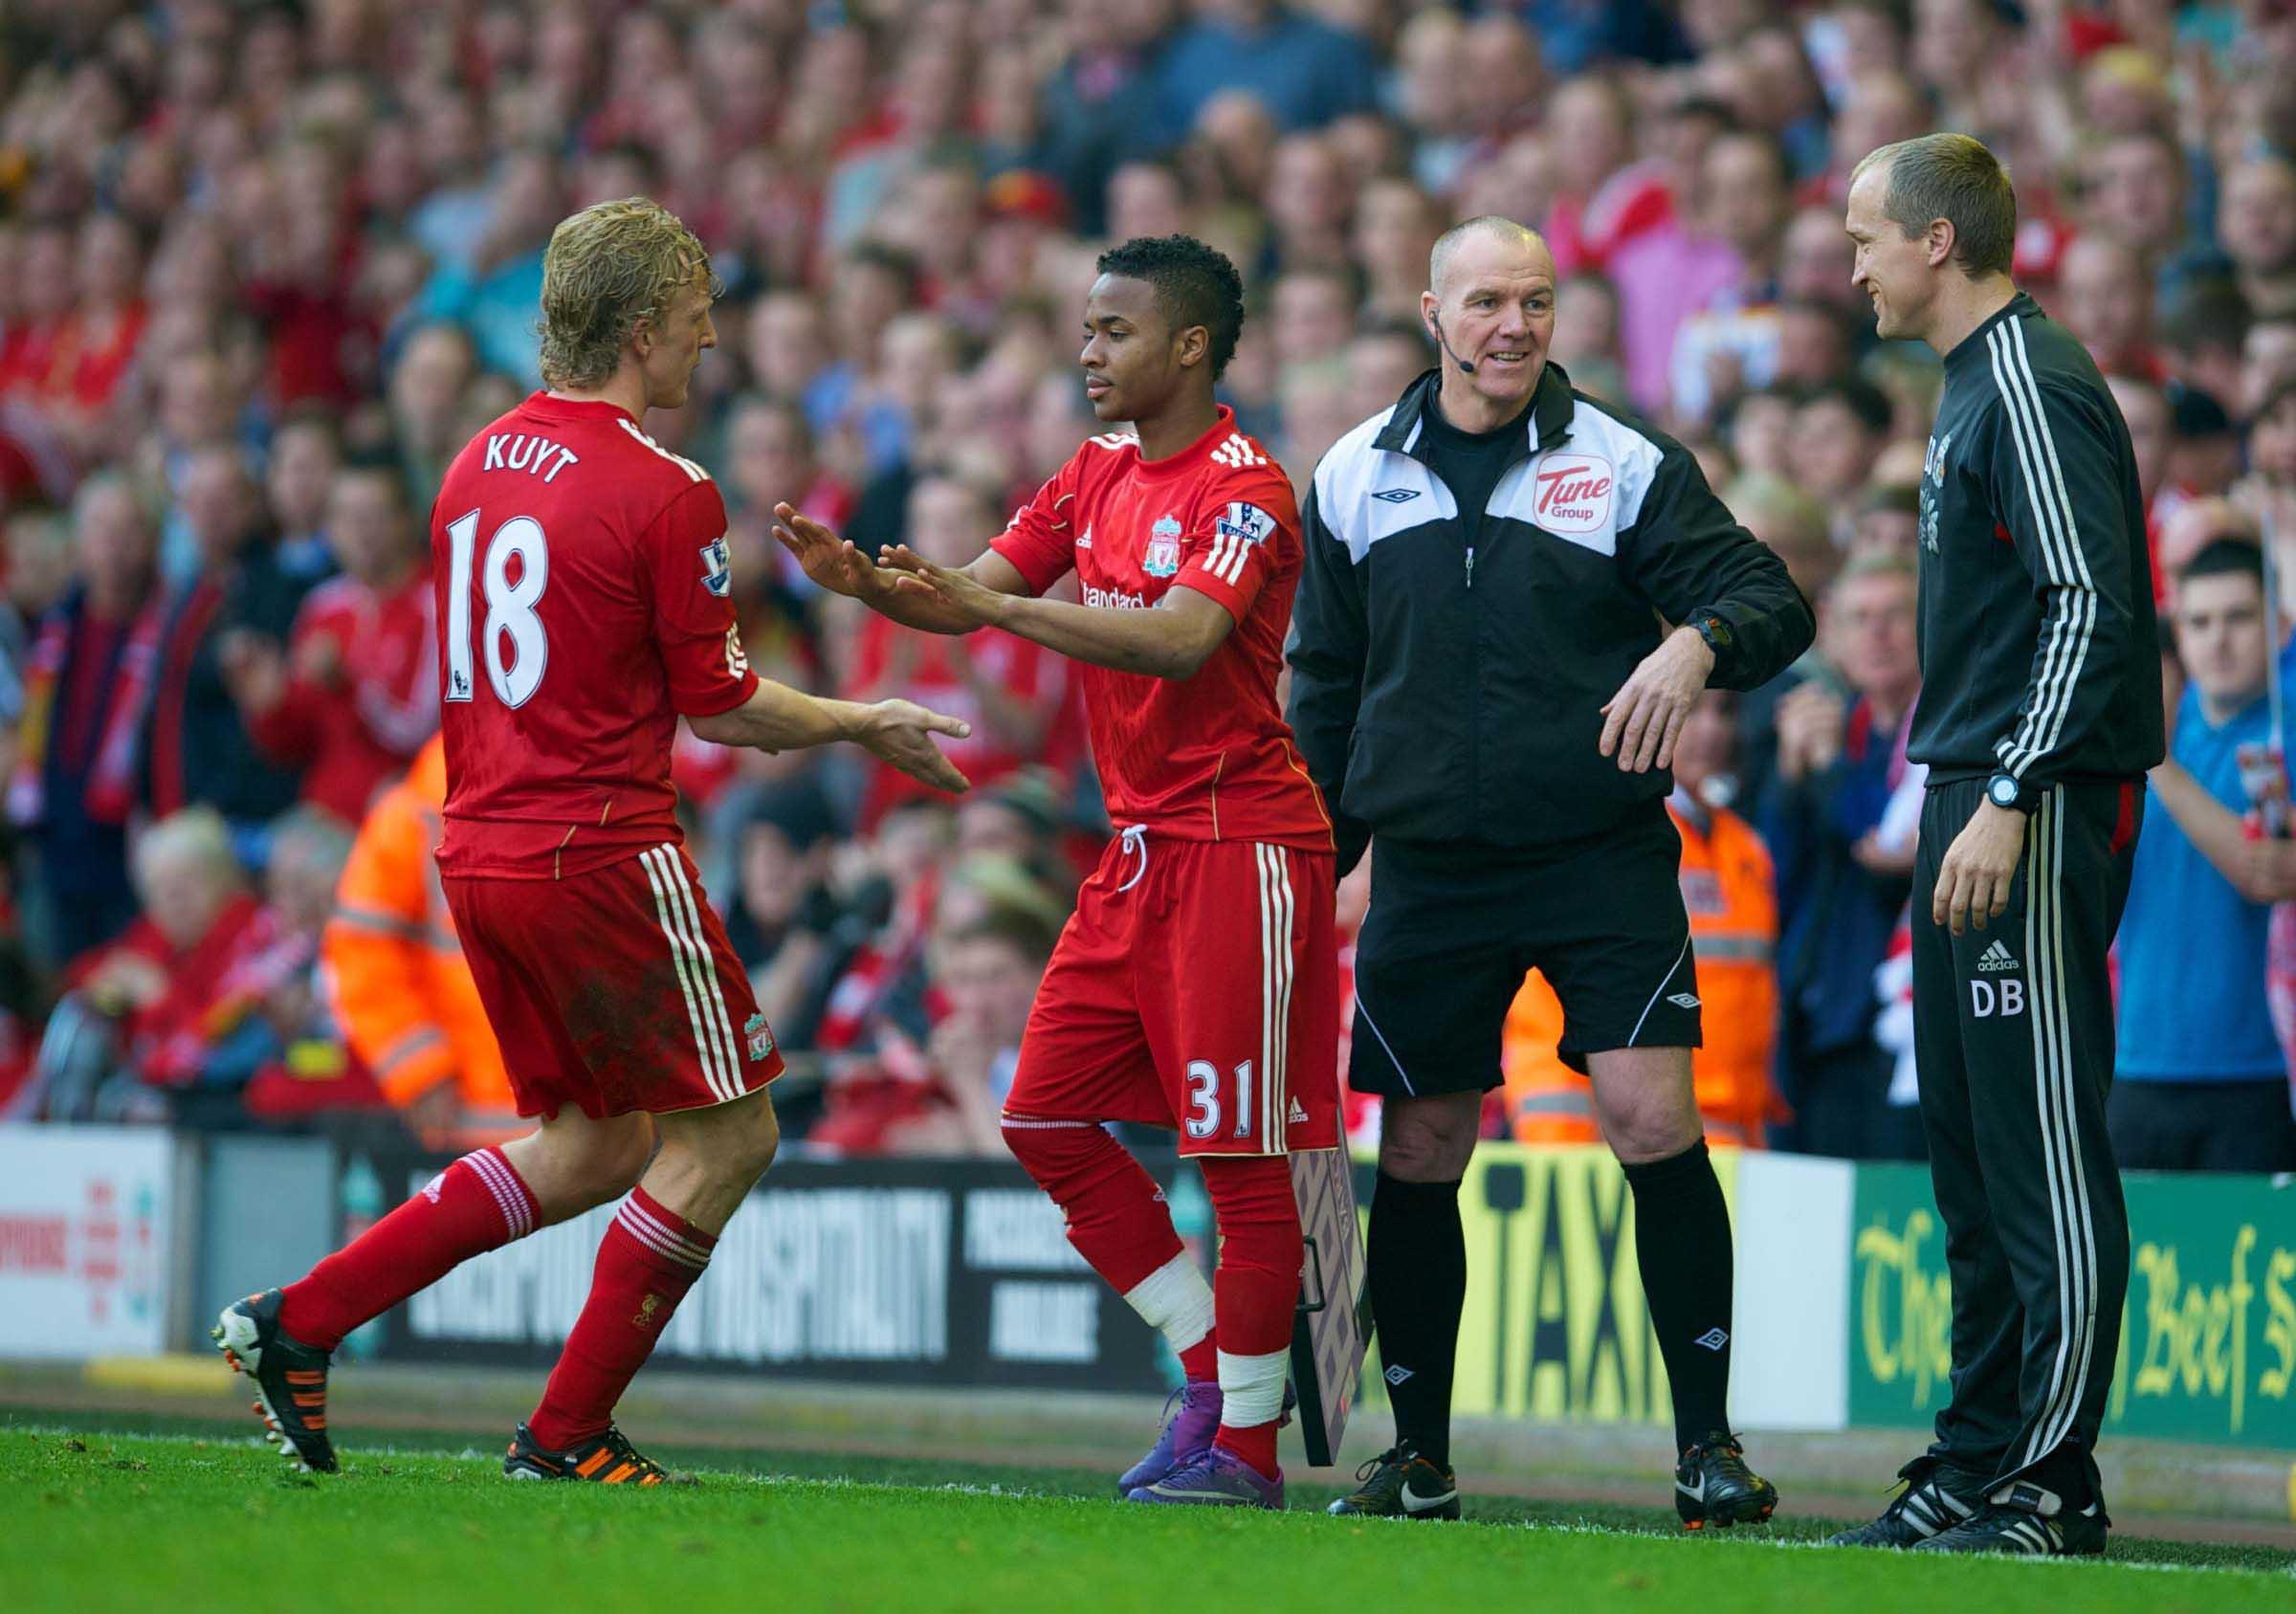 Football - FA Premier League - Liverpool FC v Wigan Athletic FC